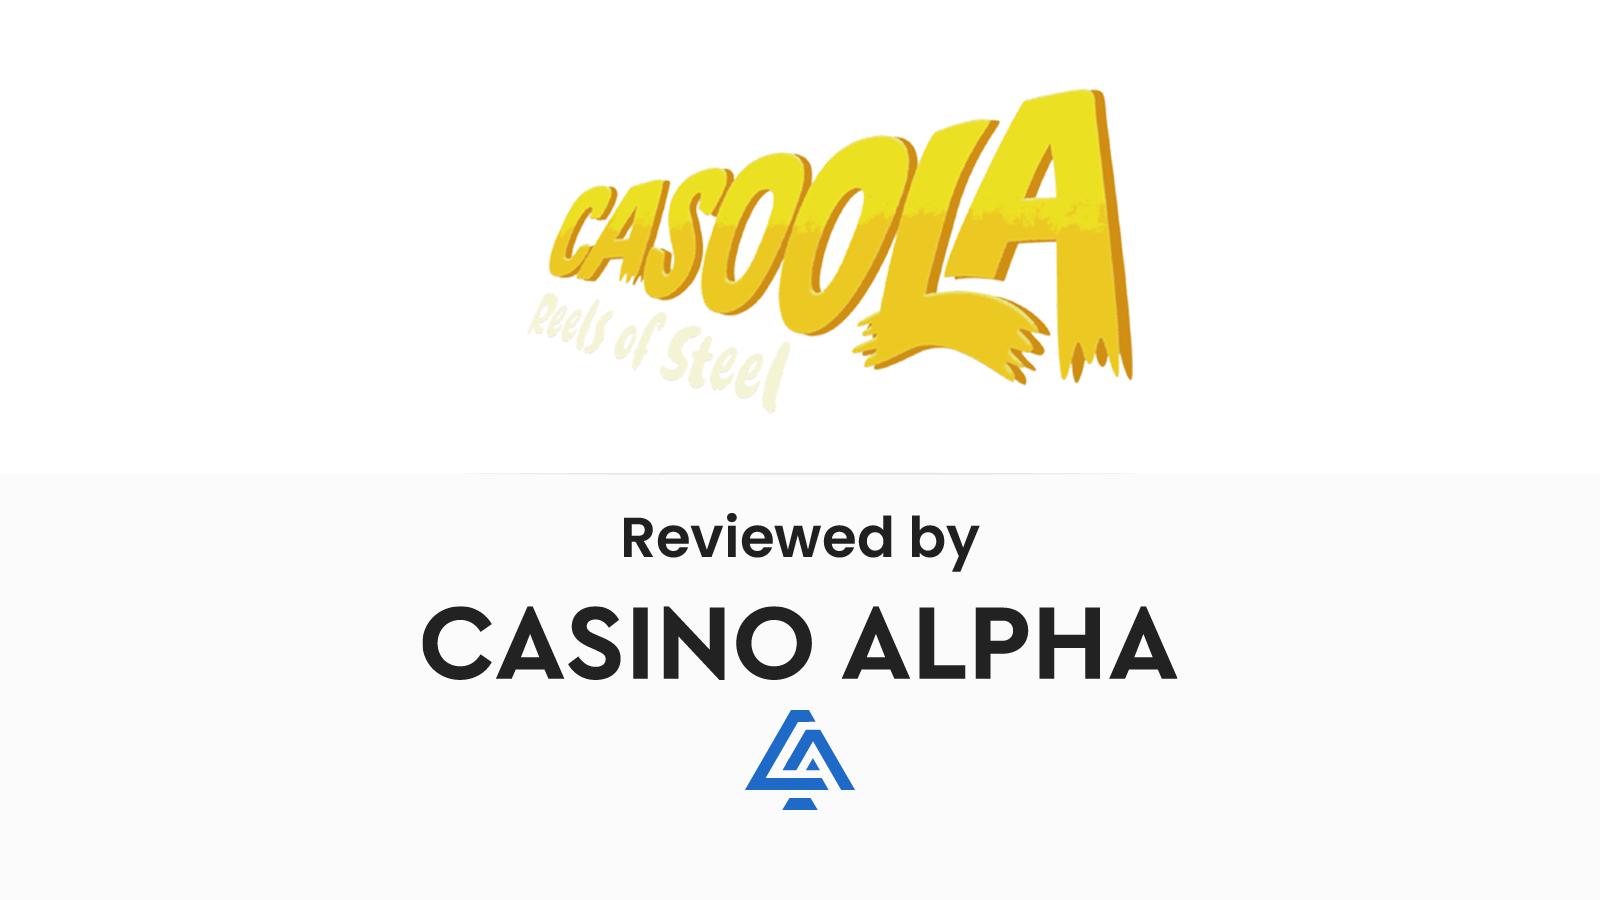 Casoola Review & Bonus codes